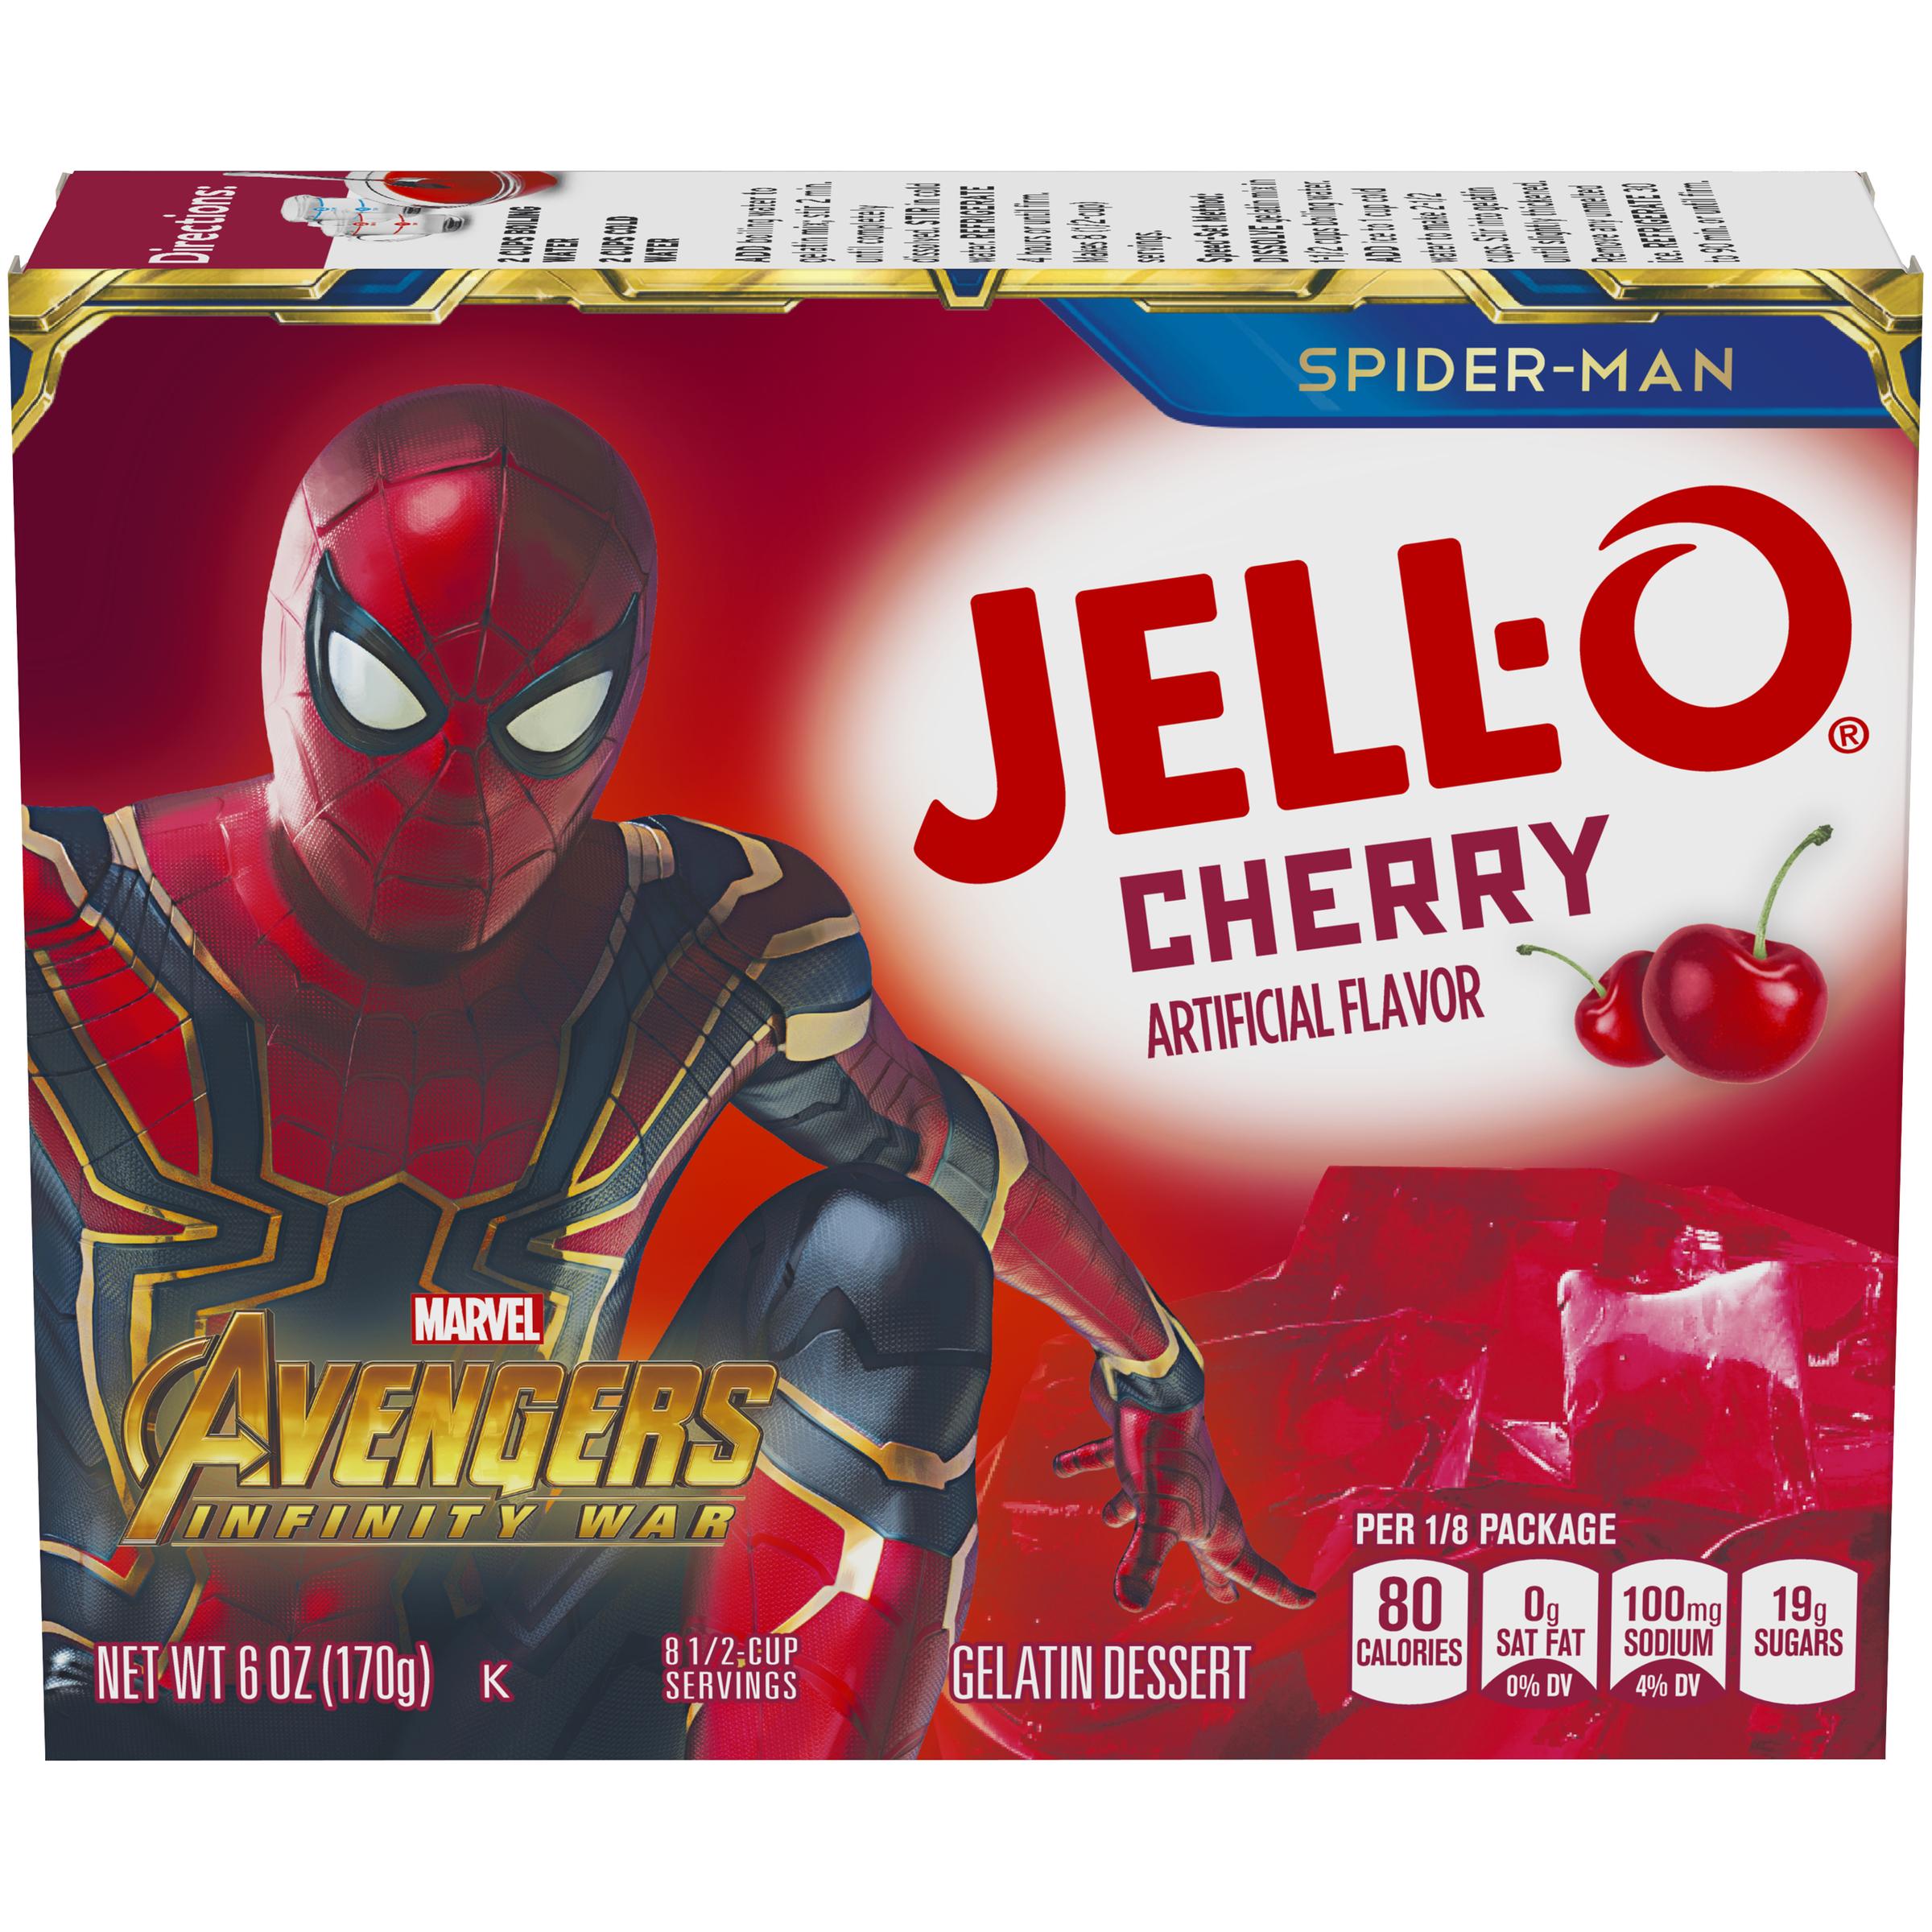 Jell-O Cherry Instant Powdered Gelatin Dessert